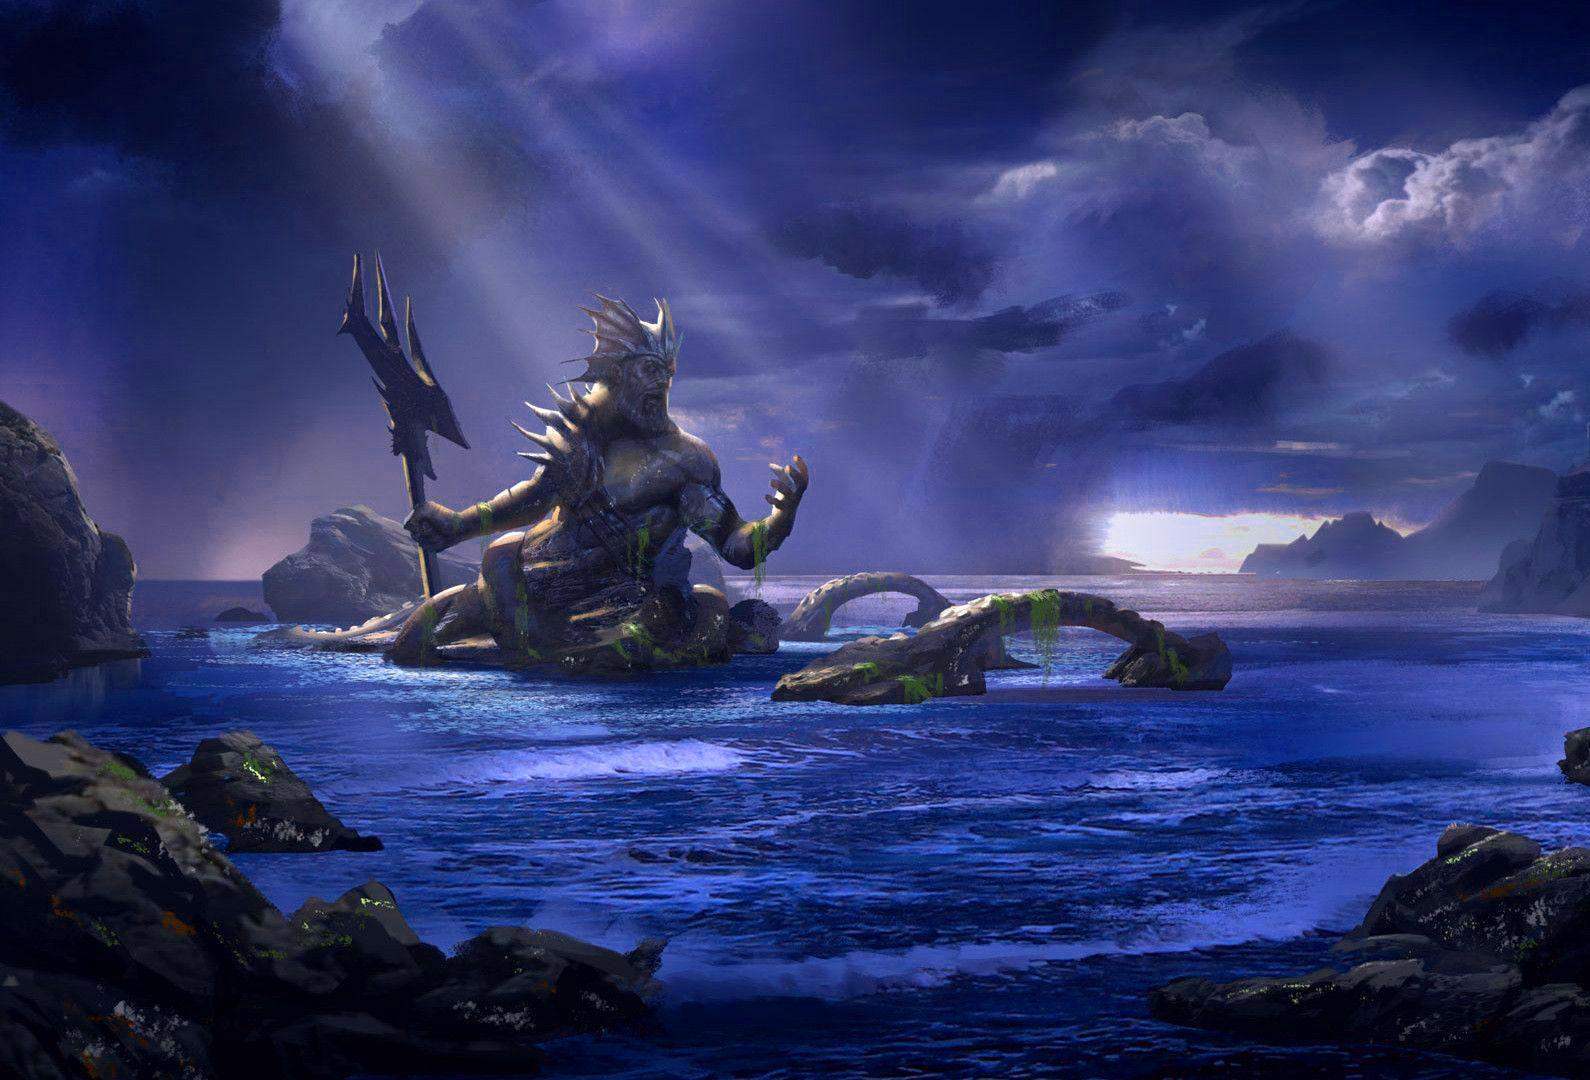 Beautiful Shiva Images pics wallpaper hd